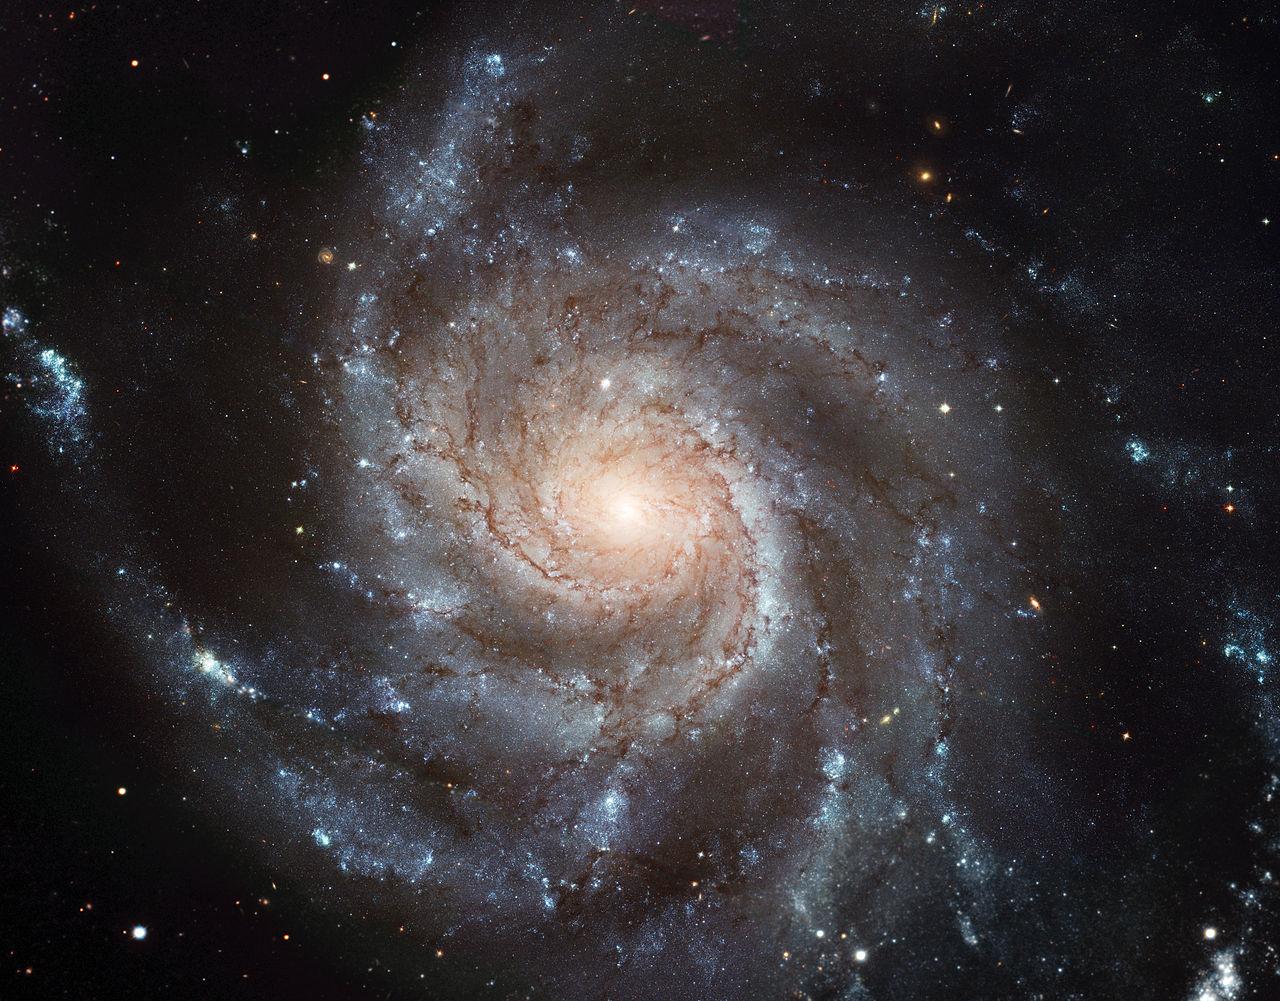 pinwheel galaxy,m101,m101 galaxy,ngc 5457